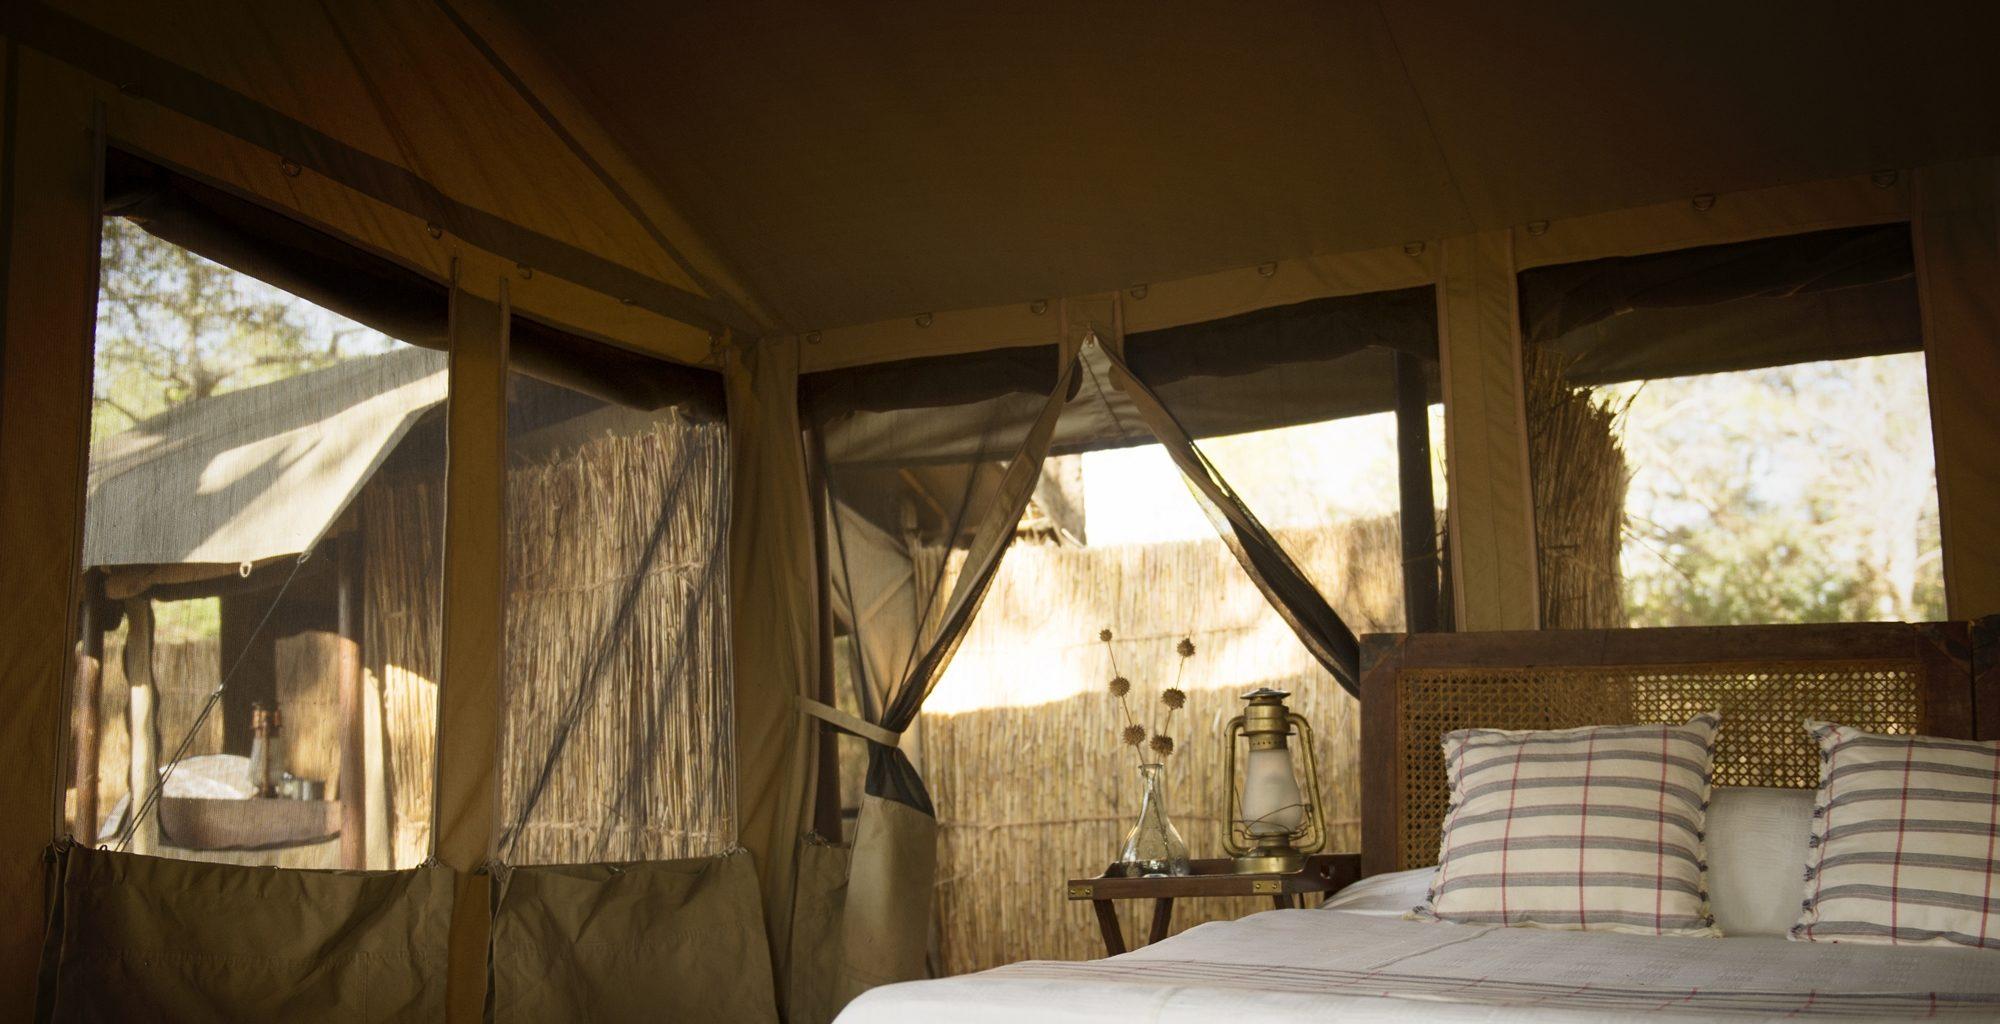 Chada-Katavi-Bedroom-Tanzania